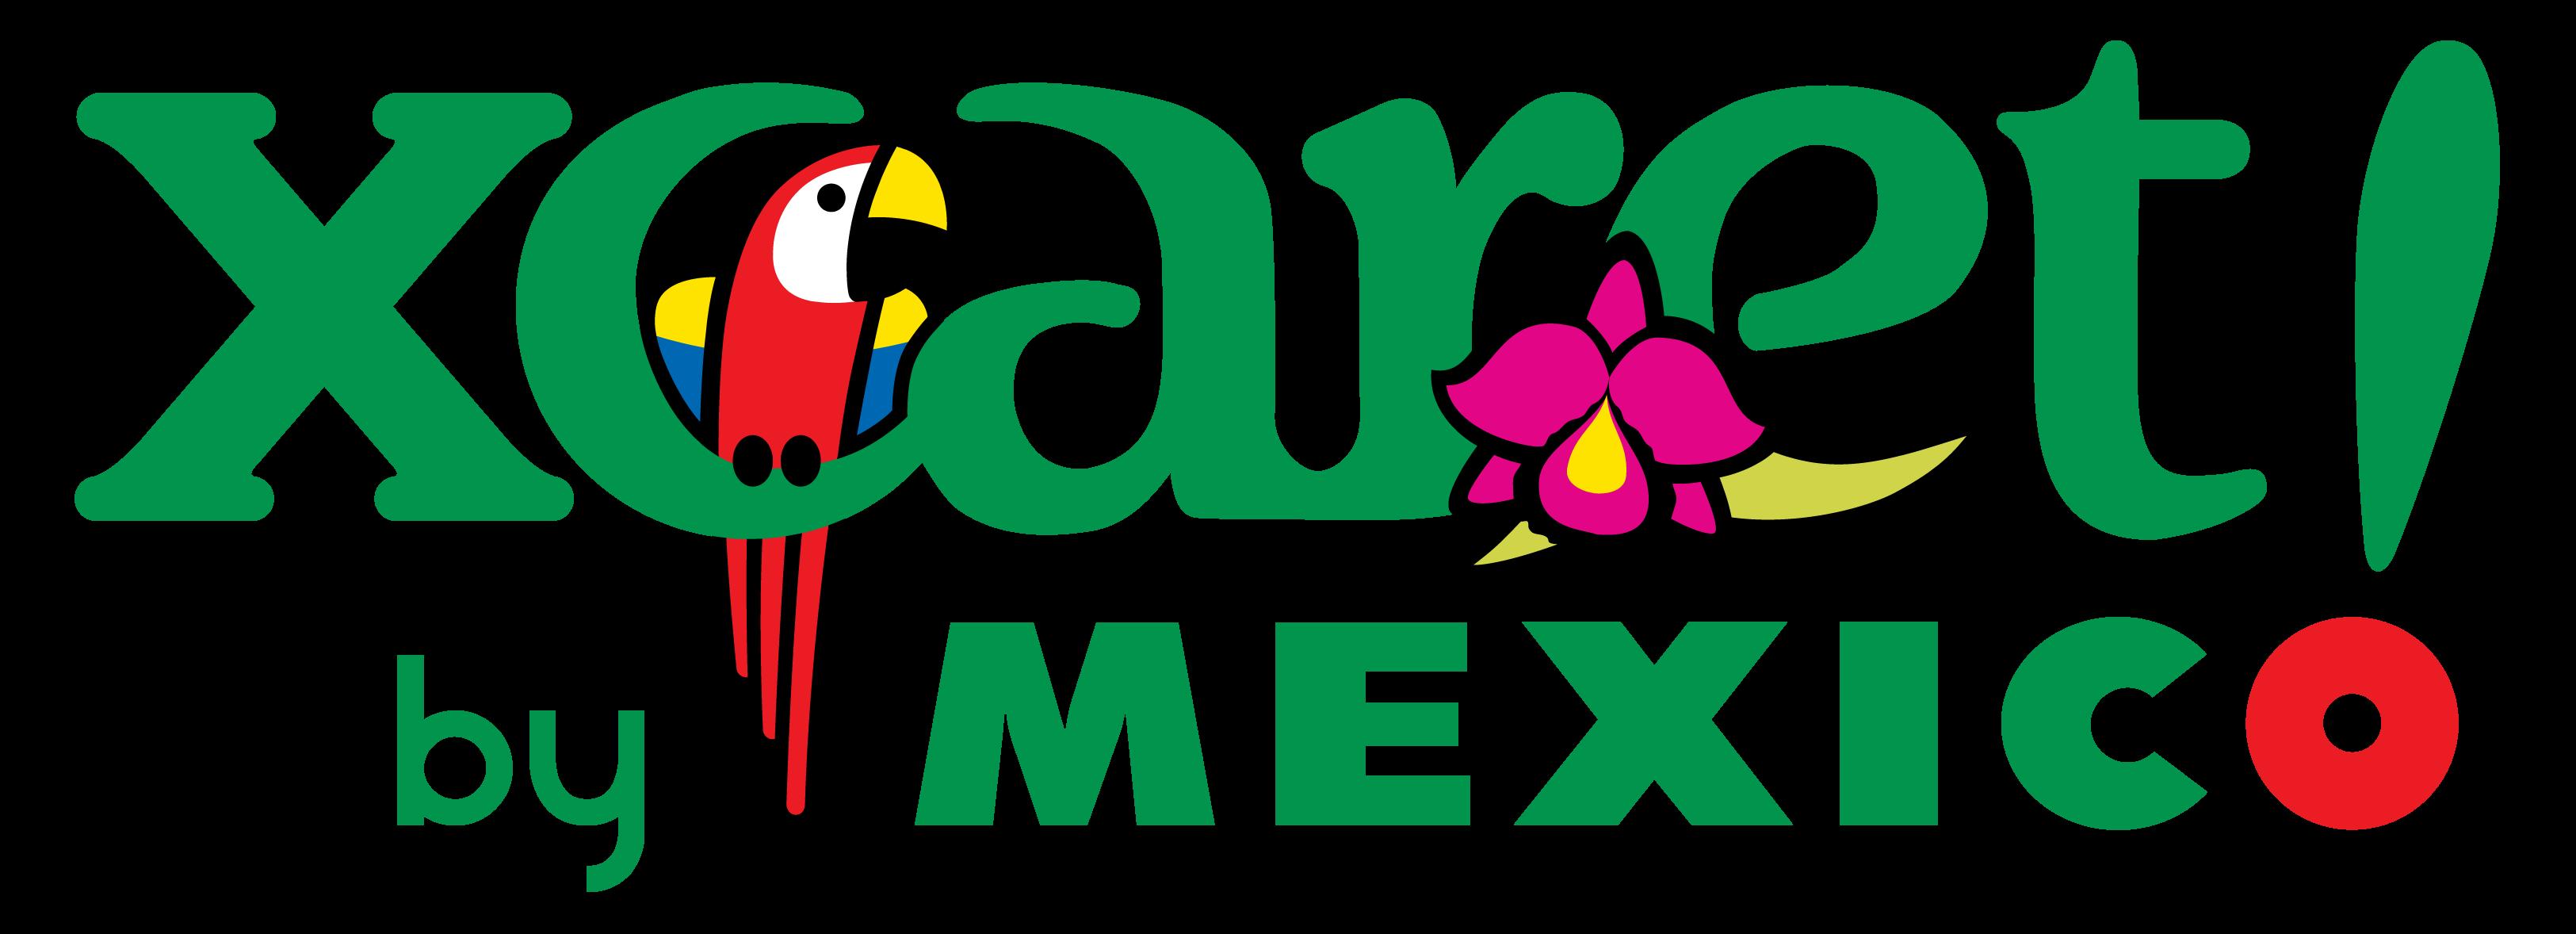 logo-xcaret